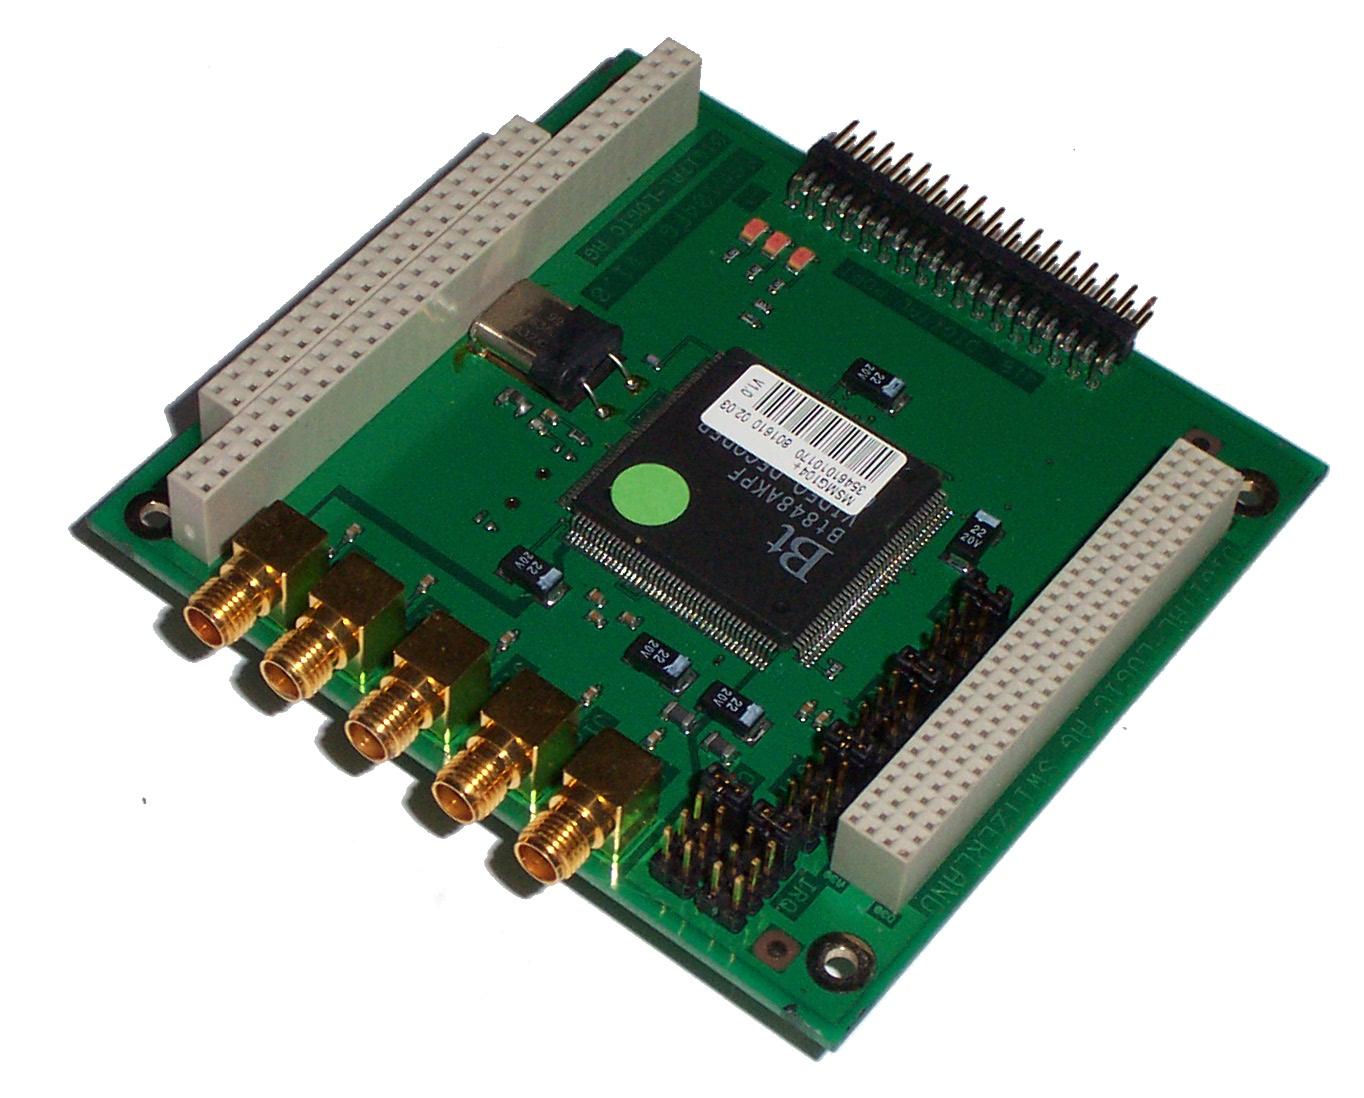 Digital-logic msmg104 + PC / 104 BT848 frame grabber board | eBay